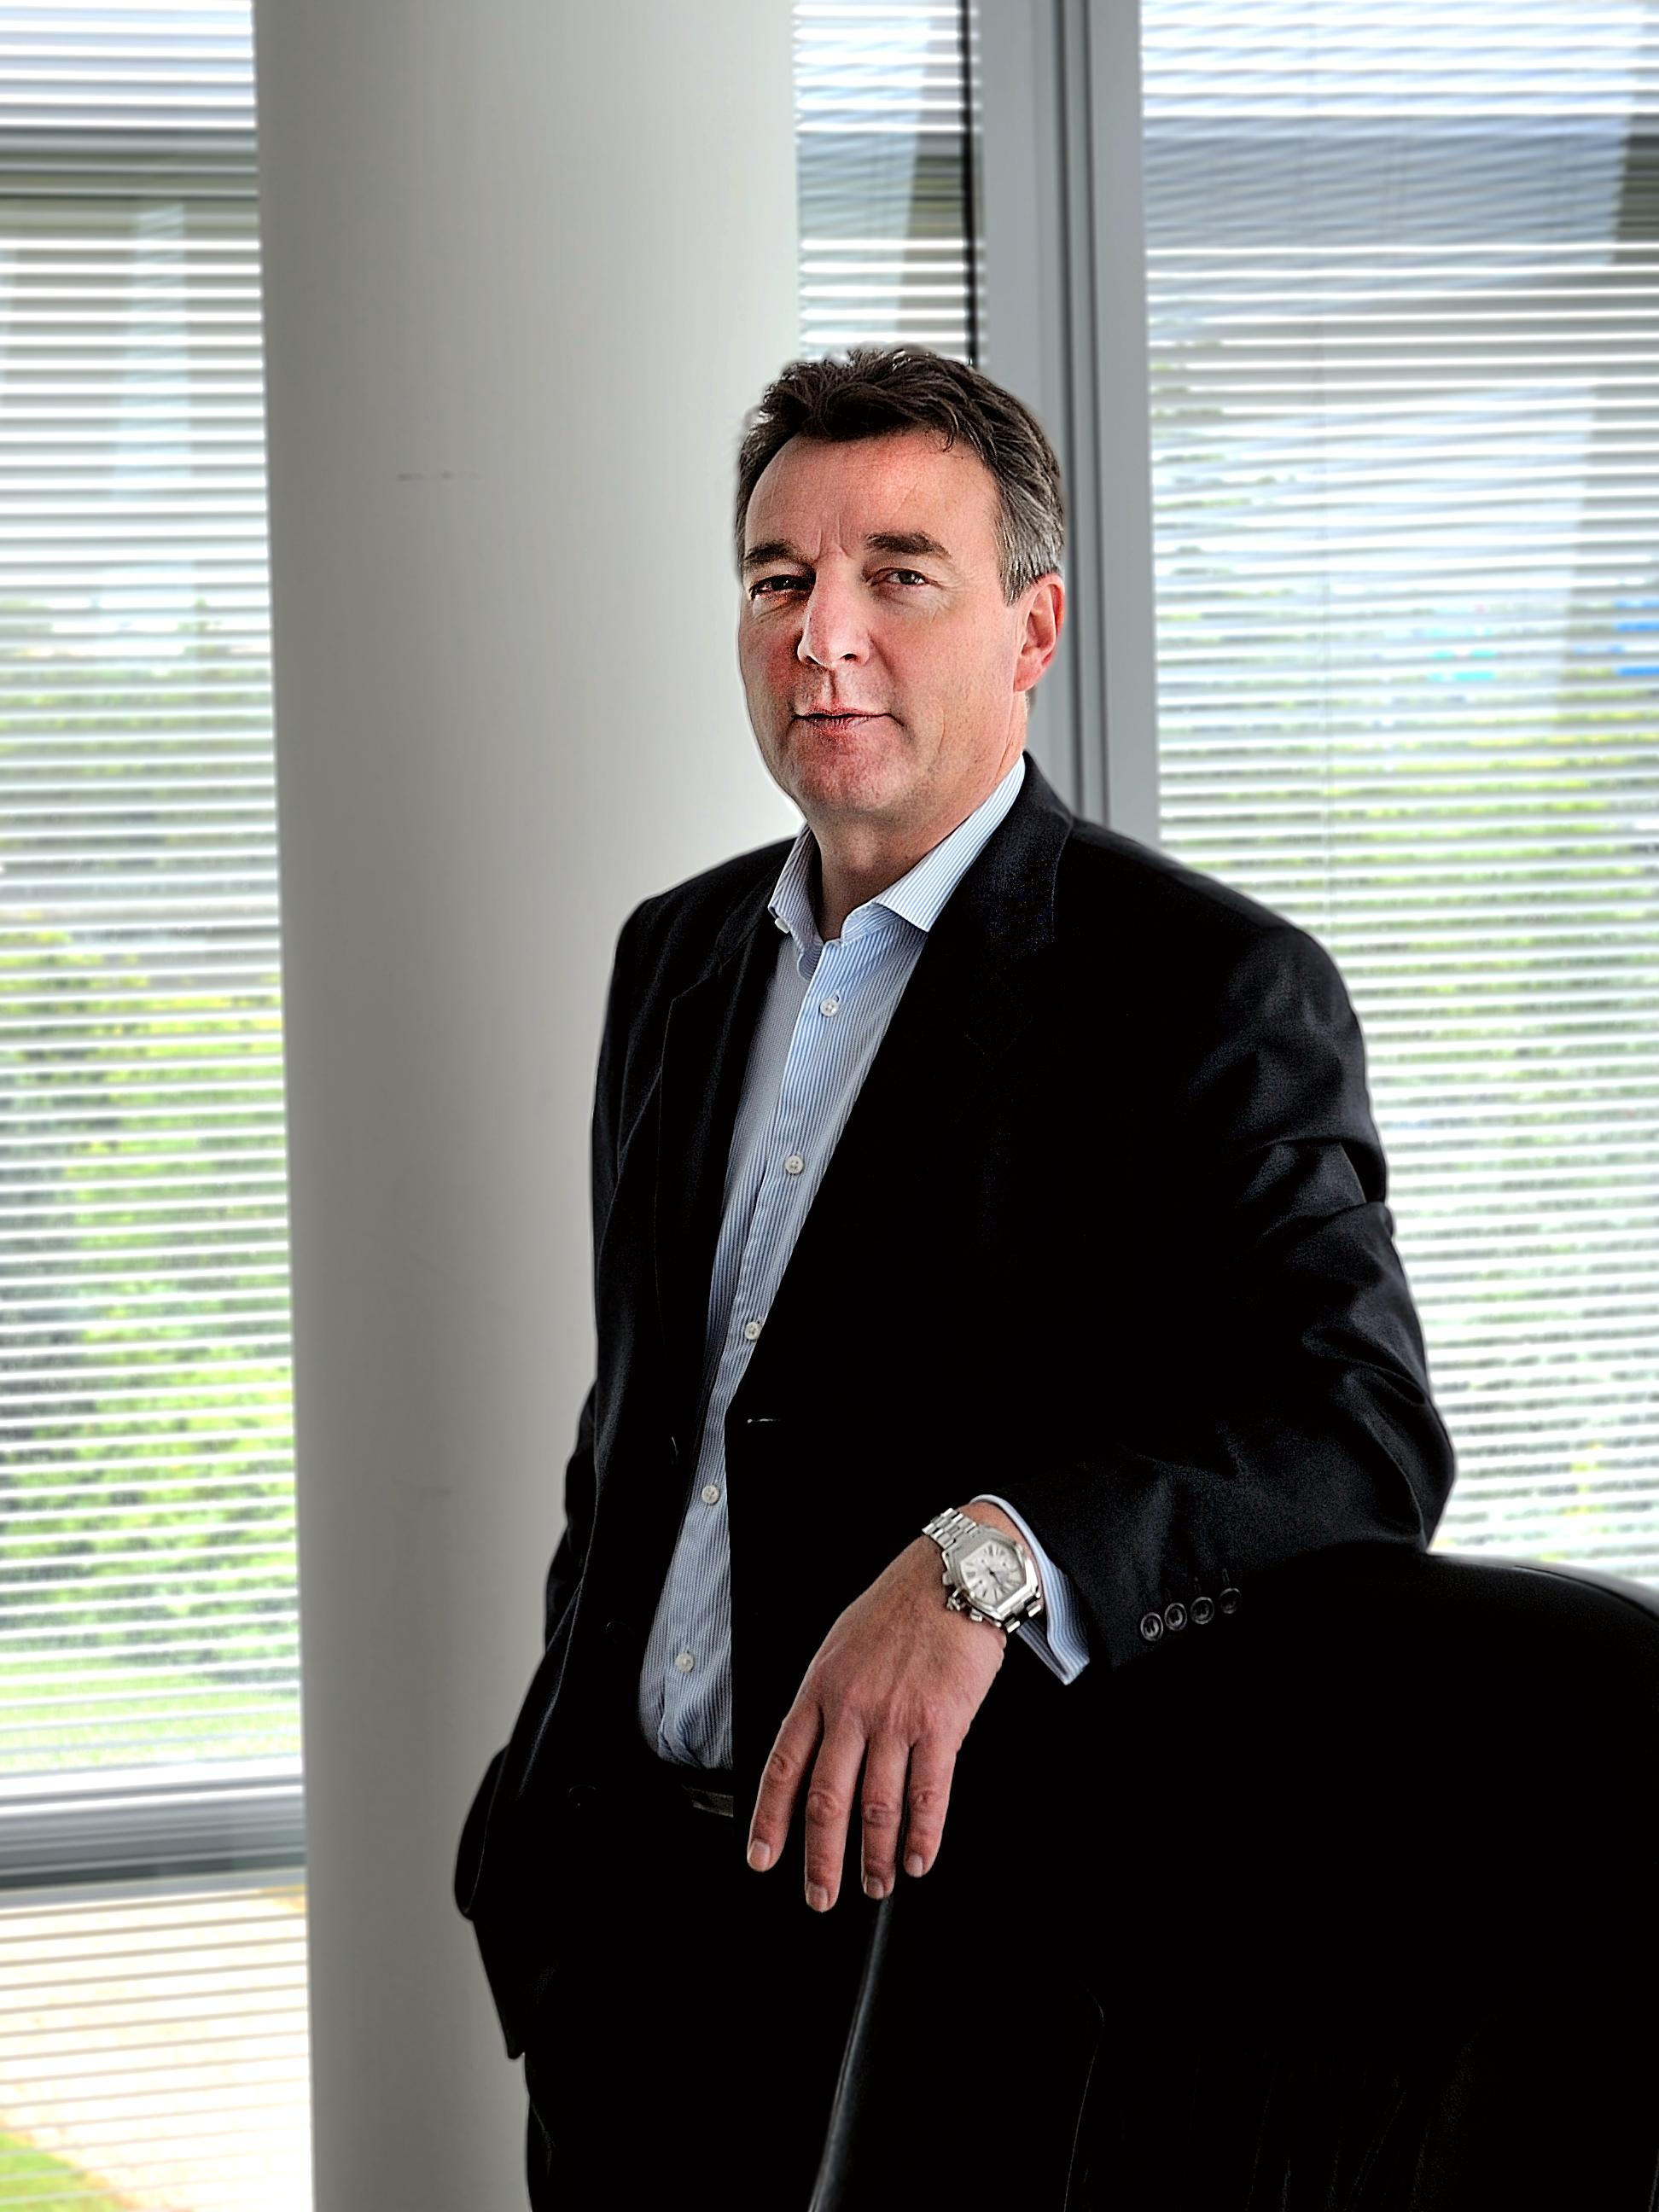 Administrerende direktør Didier Lamouche i ST-Ericsson.Foto: ST-Ericsson